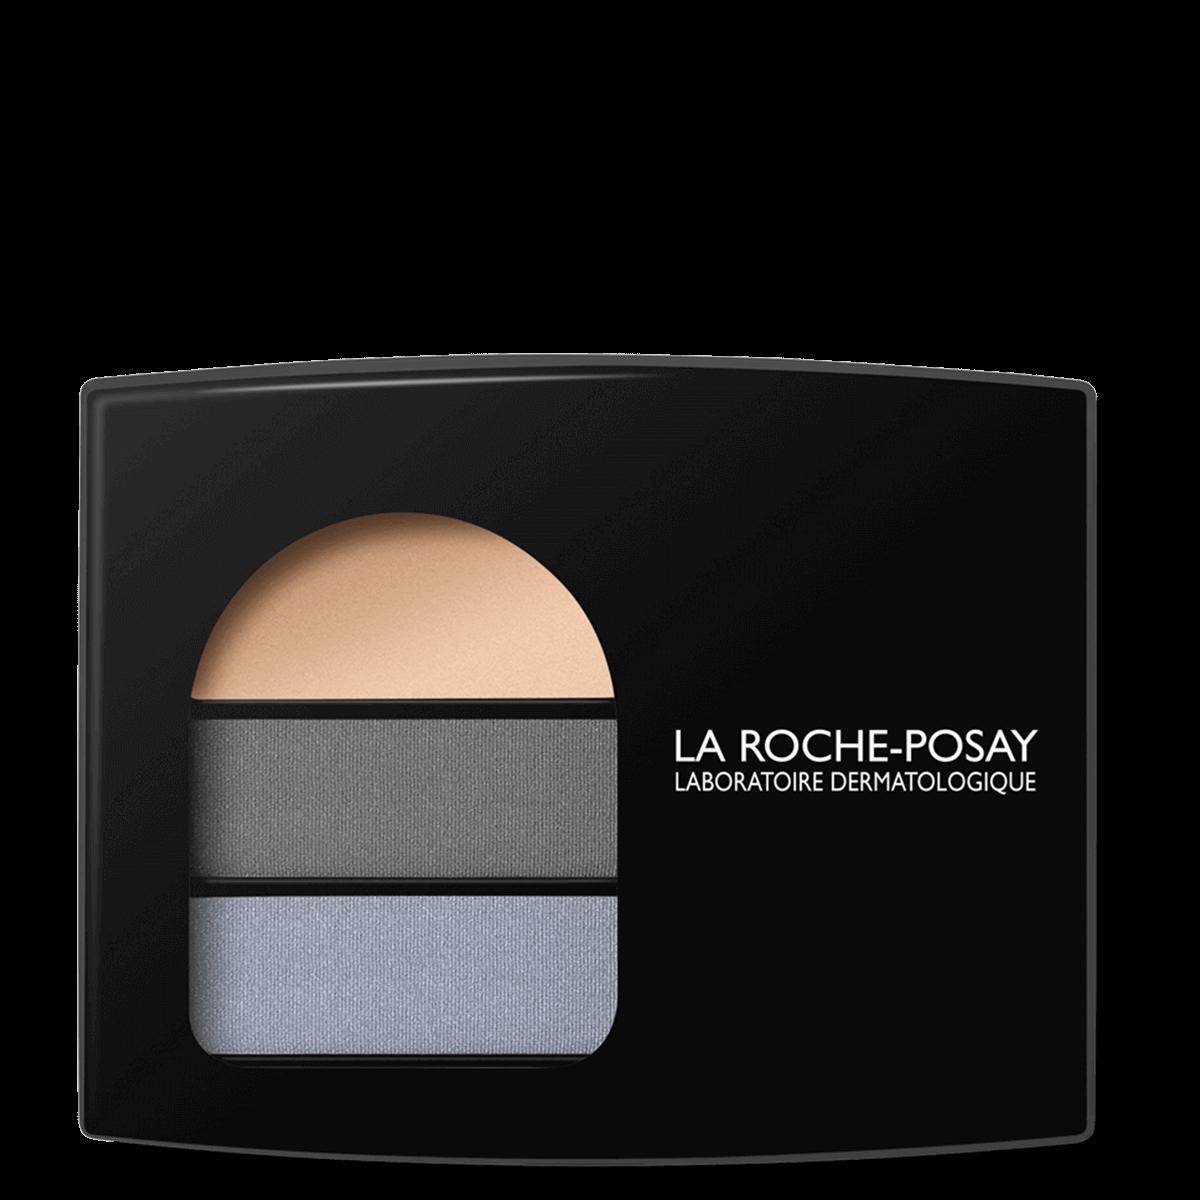 La Roche Posay Känslig Toleriane Make up EYE SHADOW DuoSmokyGris 333